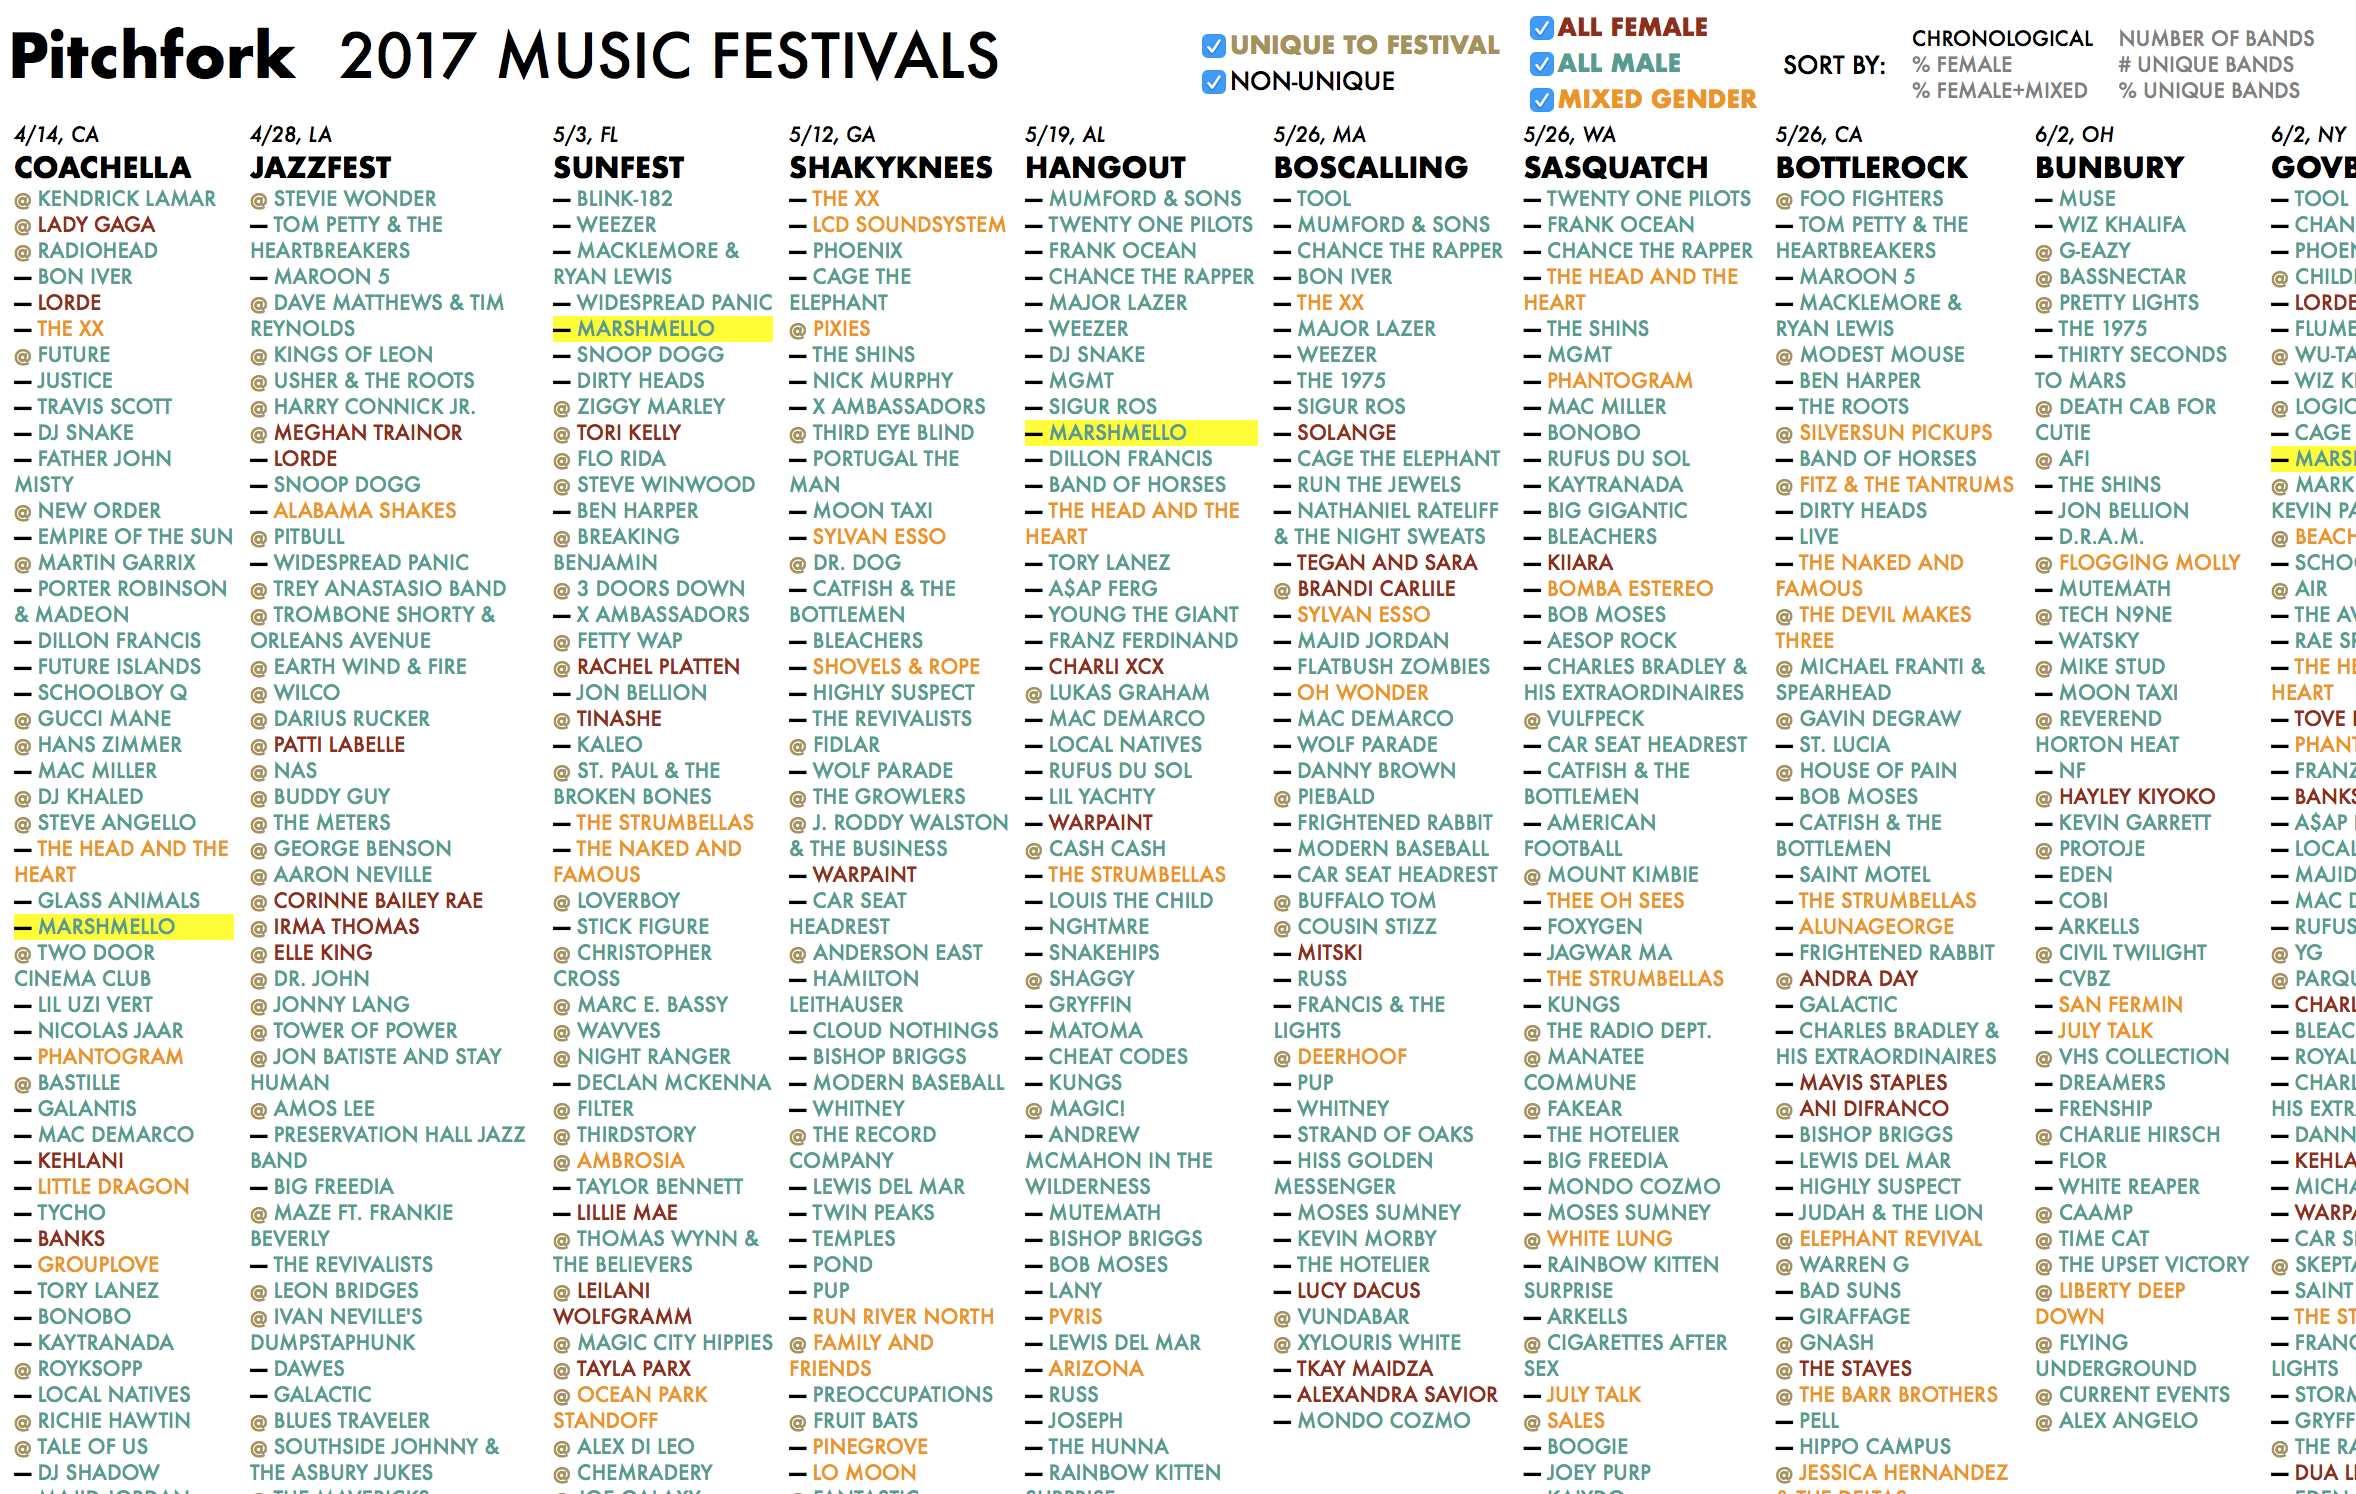 2017 US/Canadian MUSIC FESTIVALS